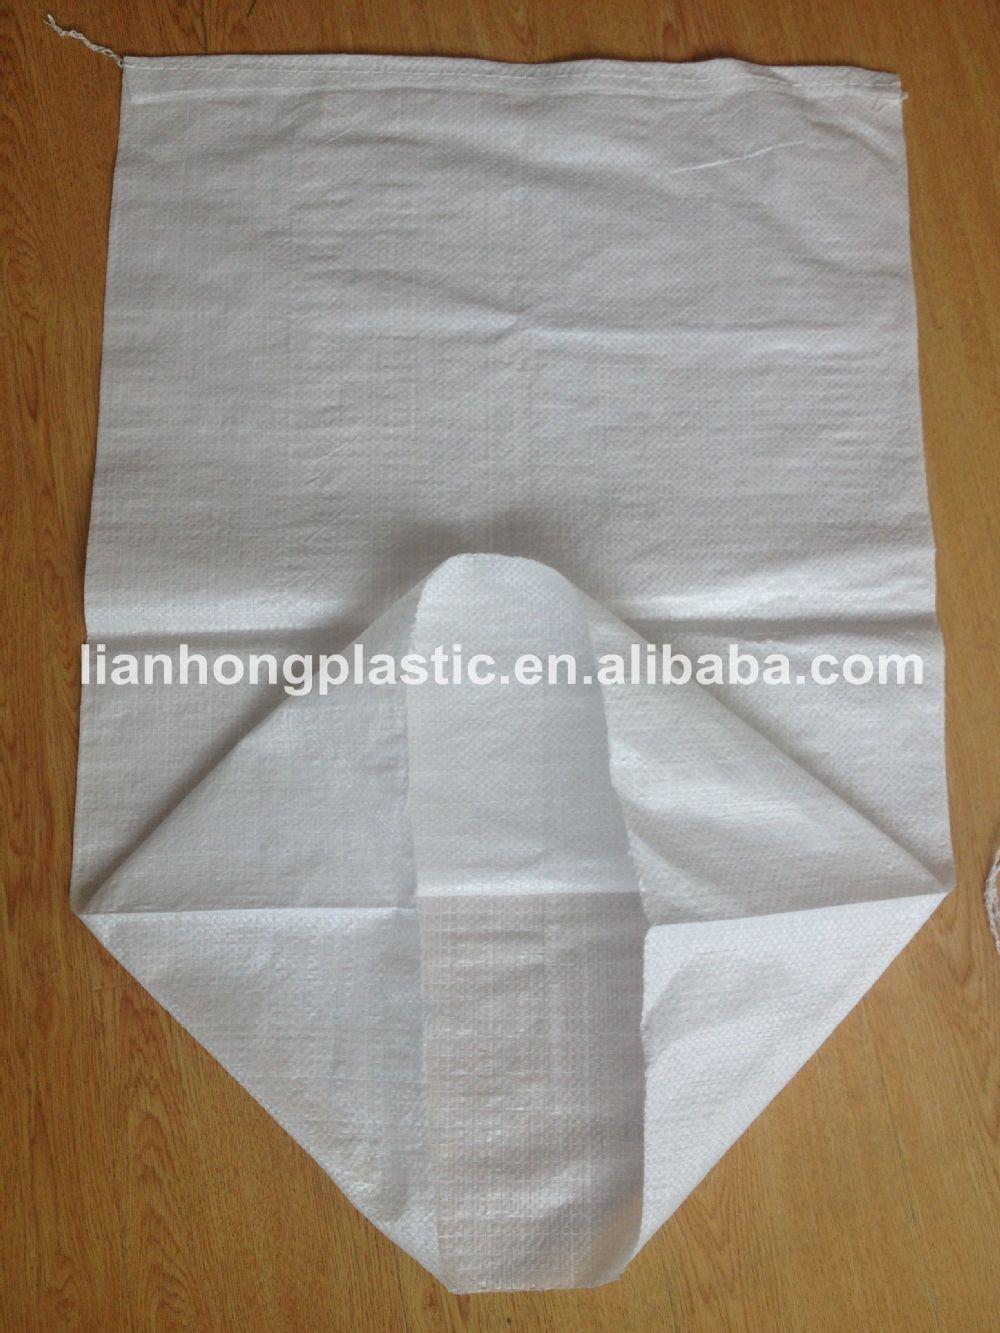 Pp Woven Sack/bag For Flour/rice 50kg Polypropylene Woven Bag,25kg ...